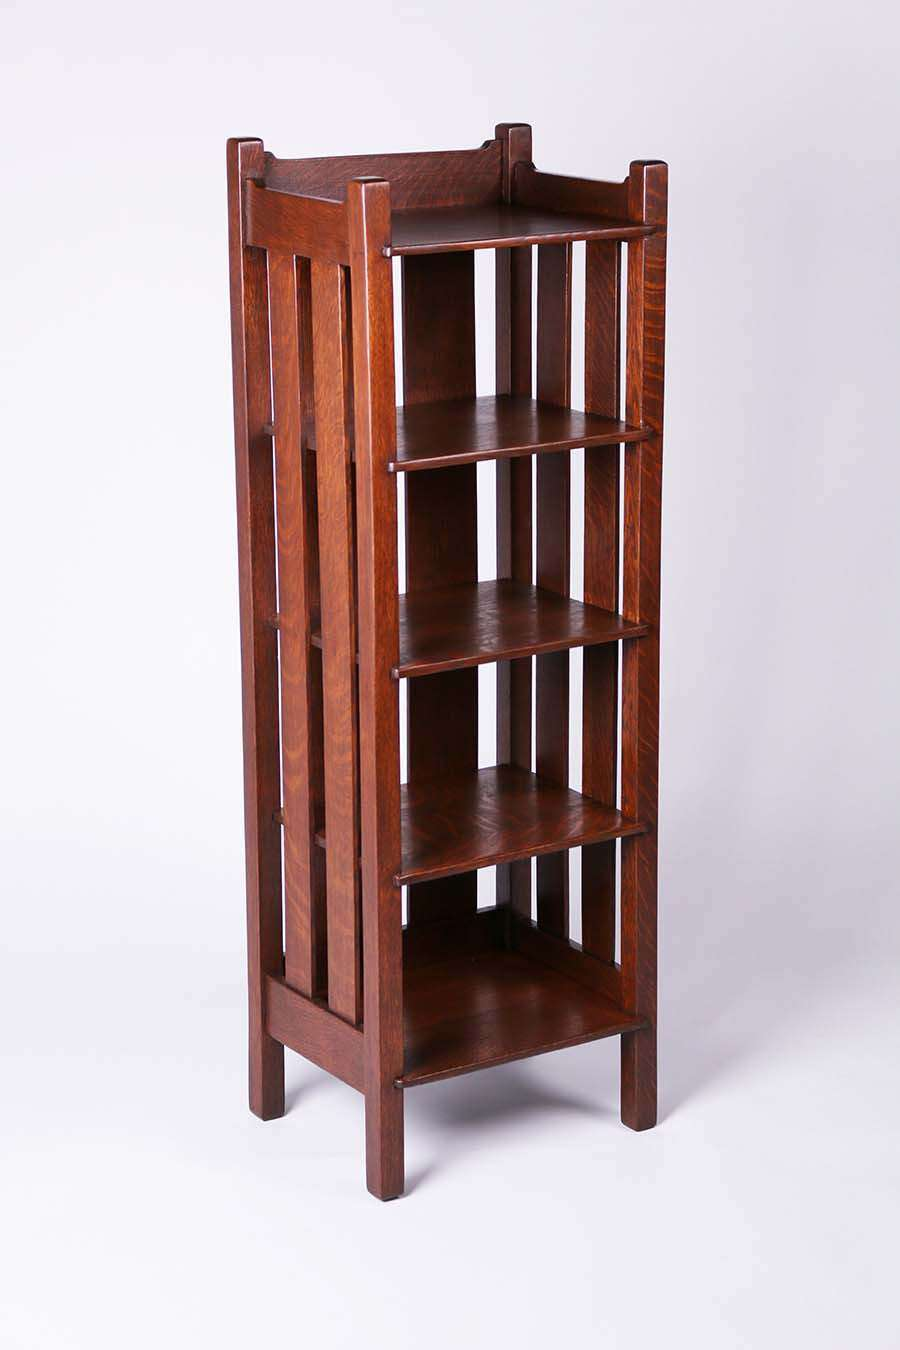 Stickley Brothers Tall Magazine Stand Bookshelf California Historical Design